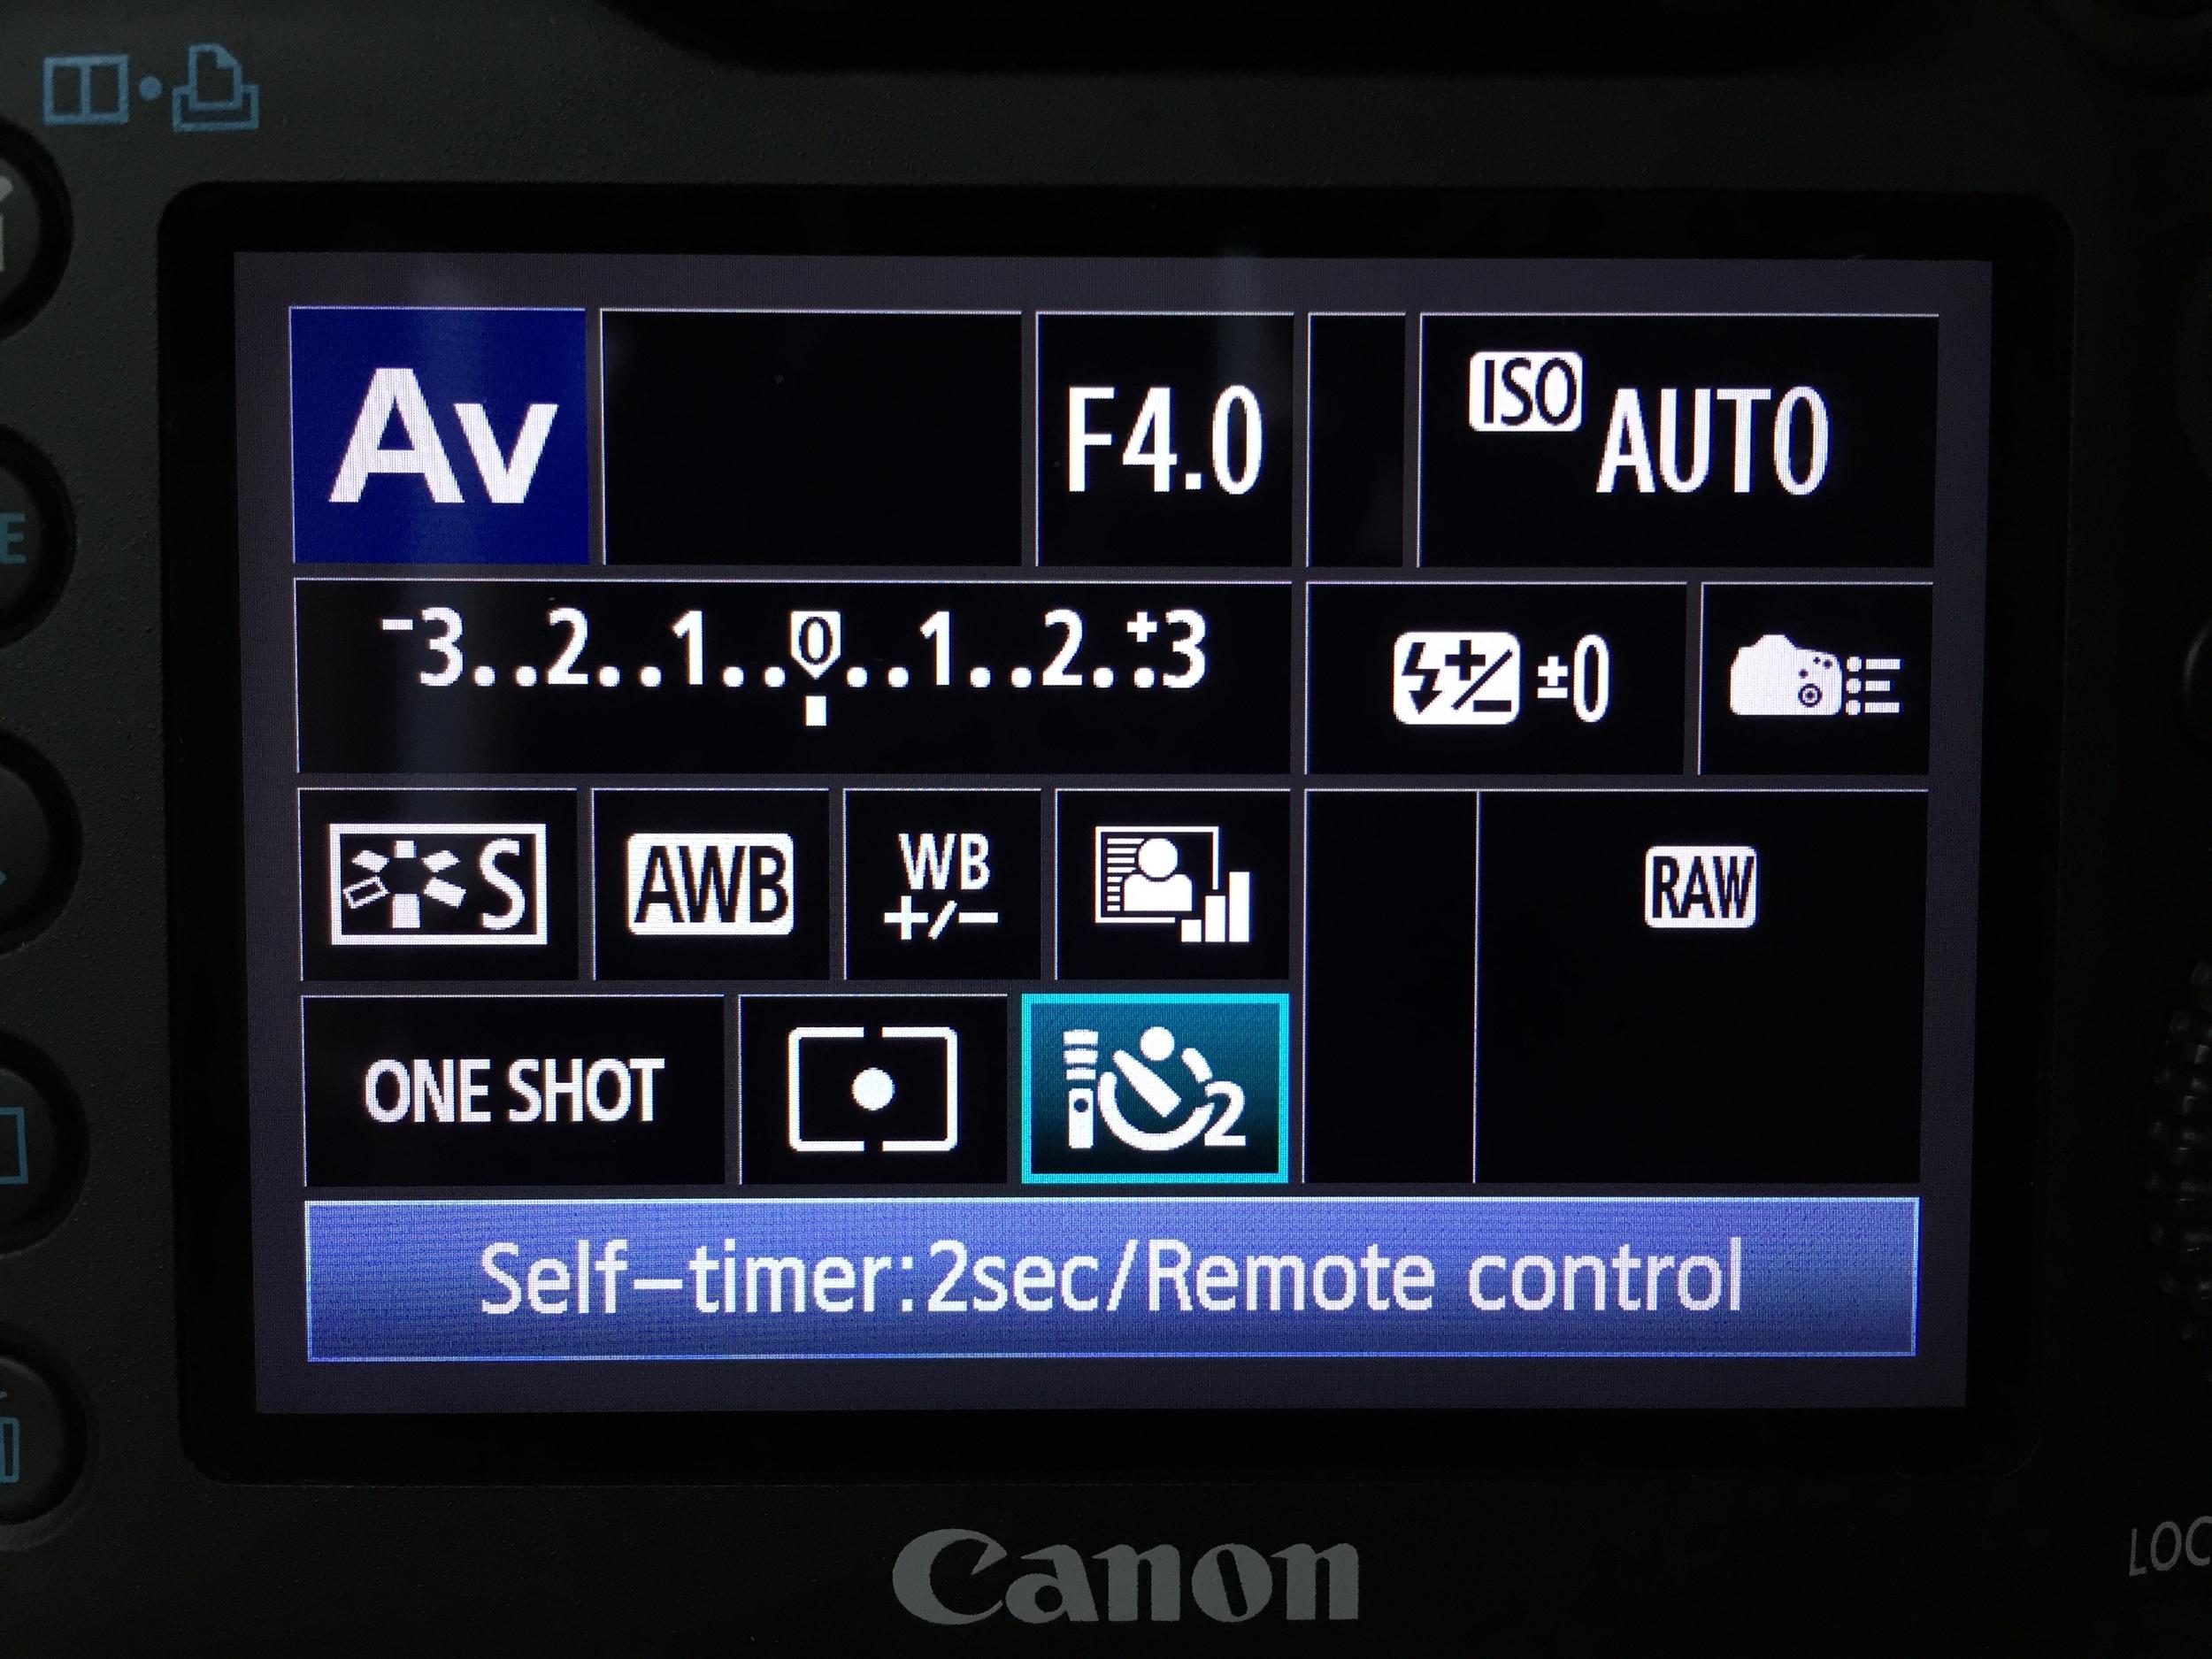 HDR Tutorial - High Dynamic Range Photography - Let's Go Bravo